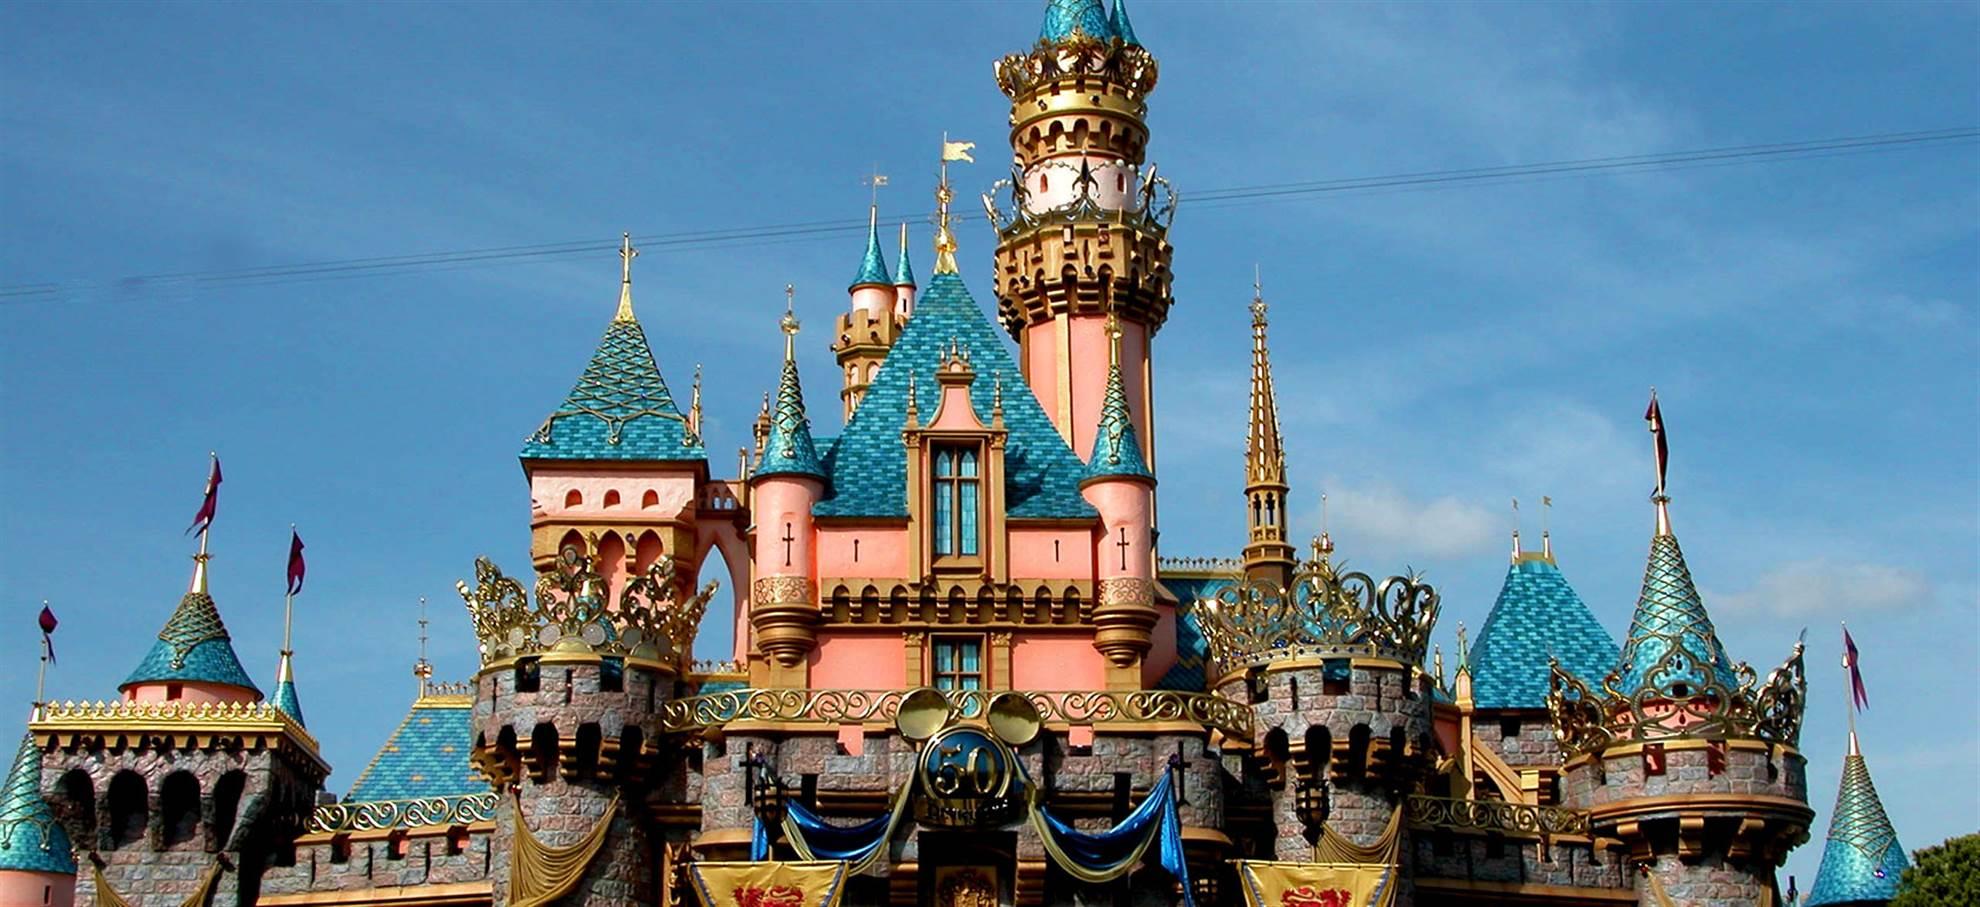 Disneyland® Paris 1 Jour 2 Parcs avec Transport